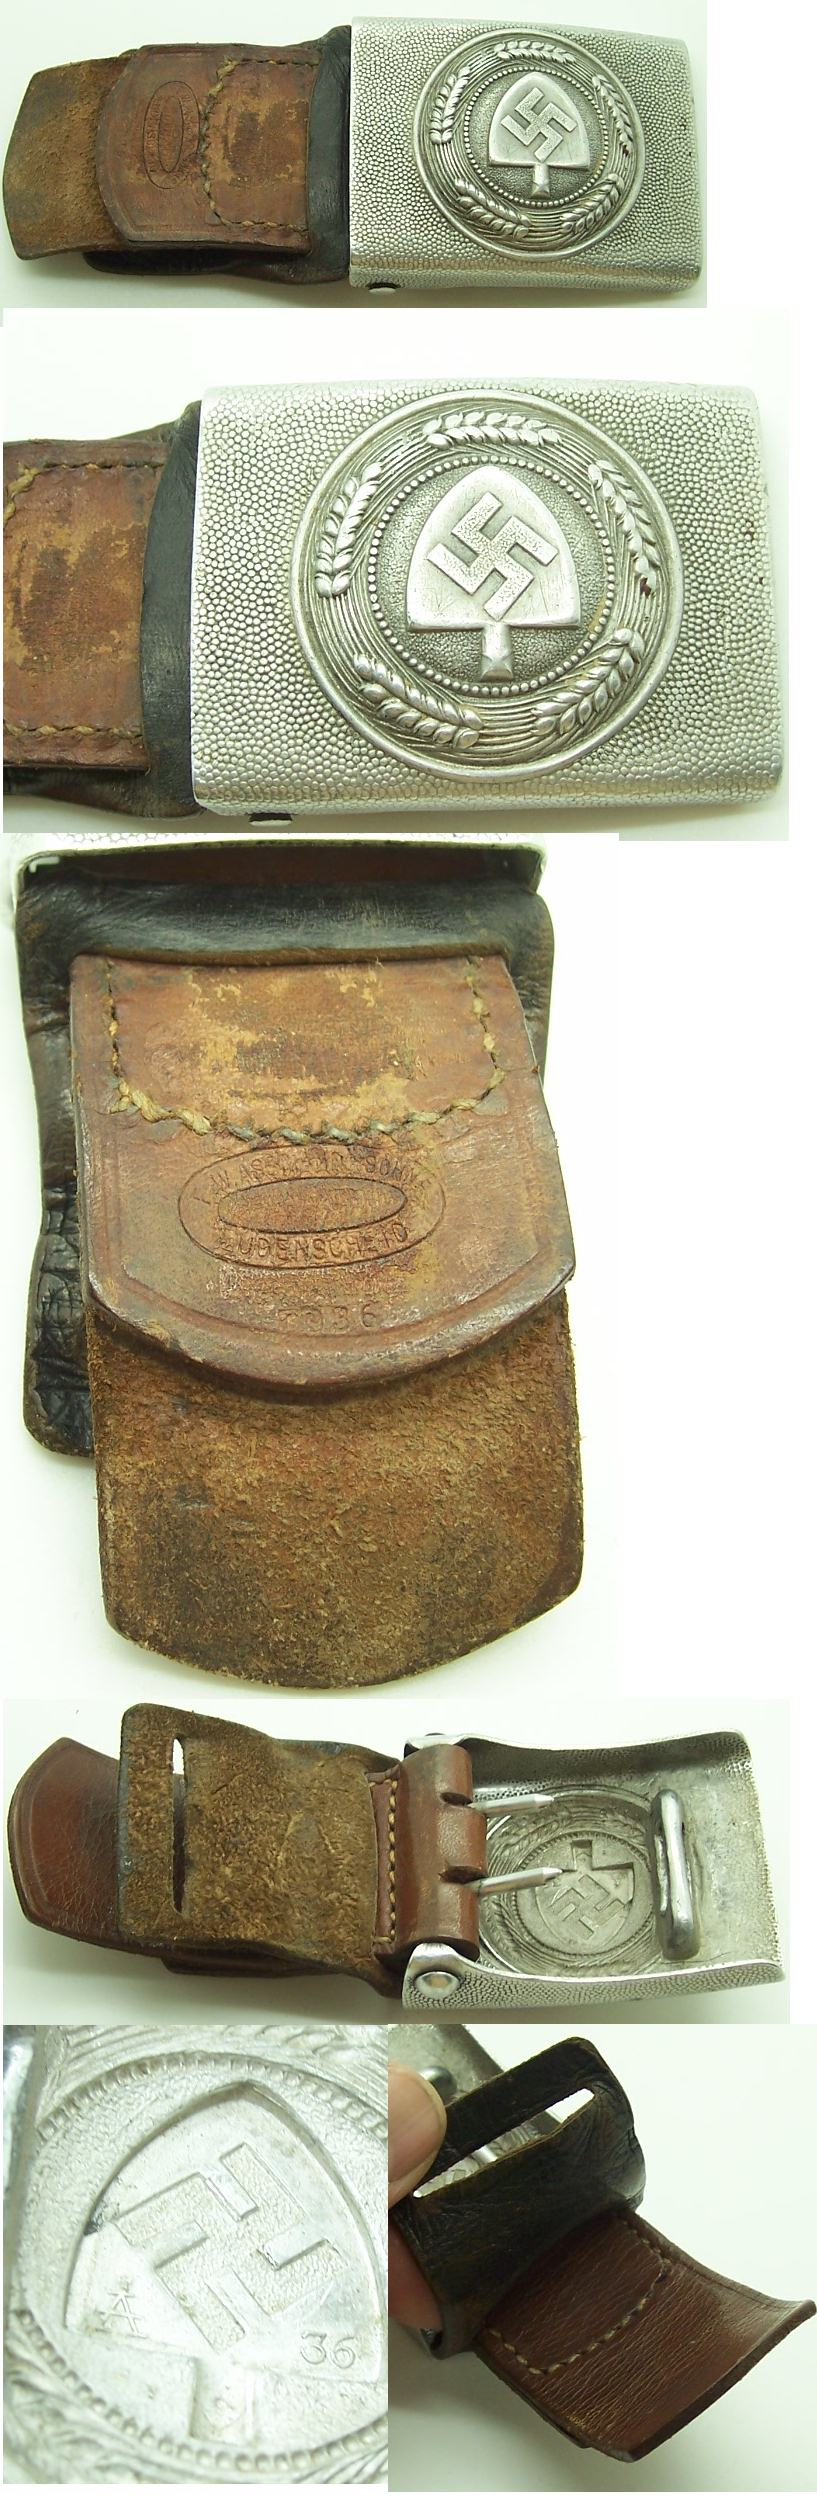 Tabbed RAD EM Belt Buckle 1936 by Assmann